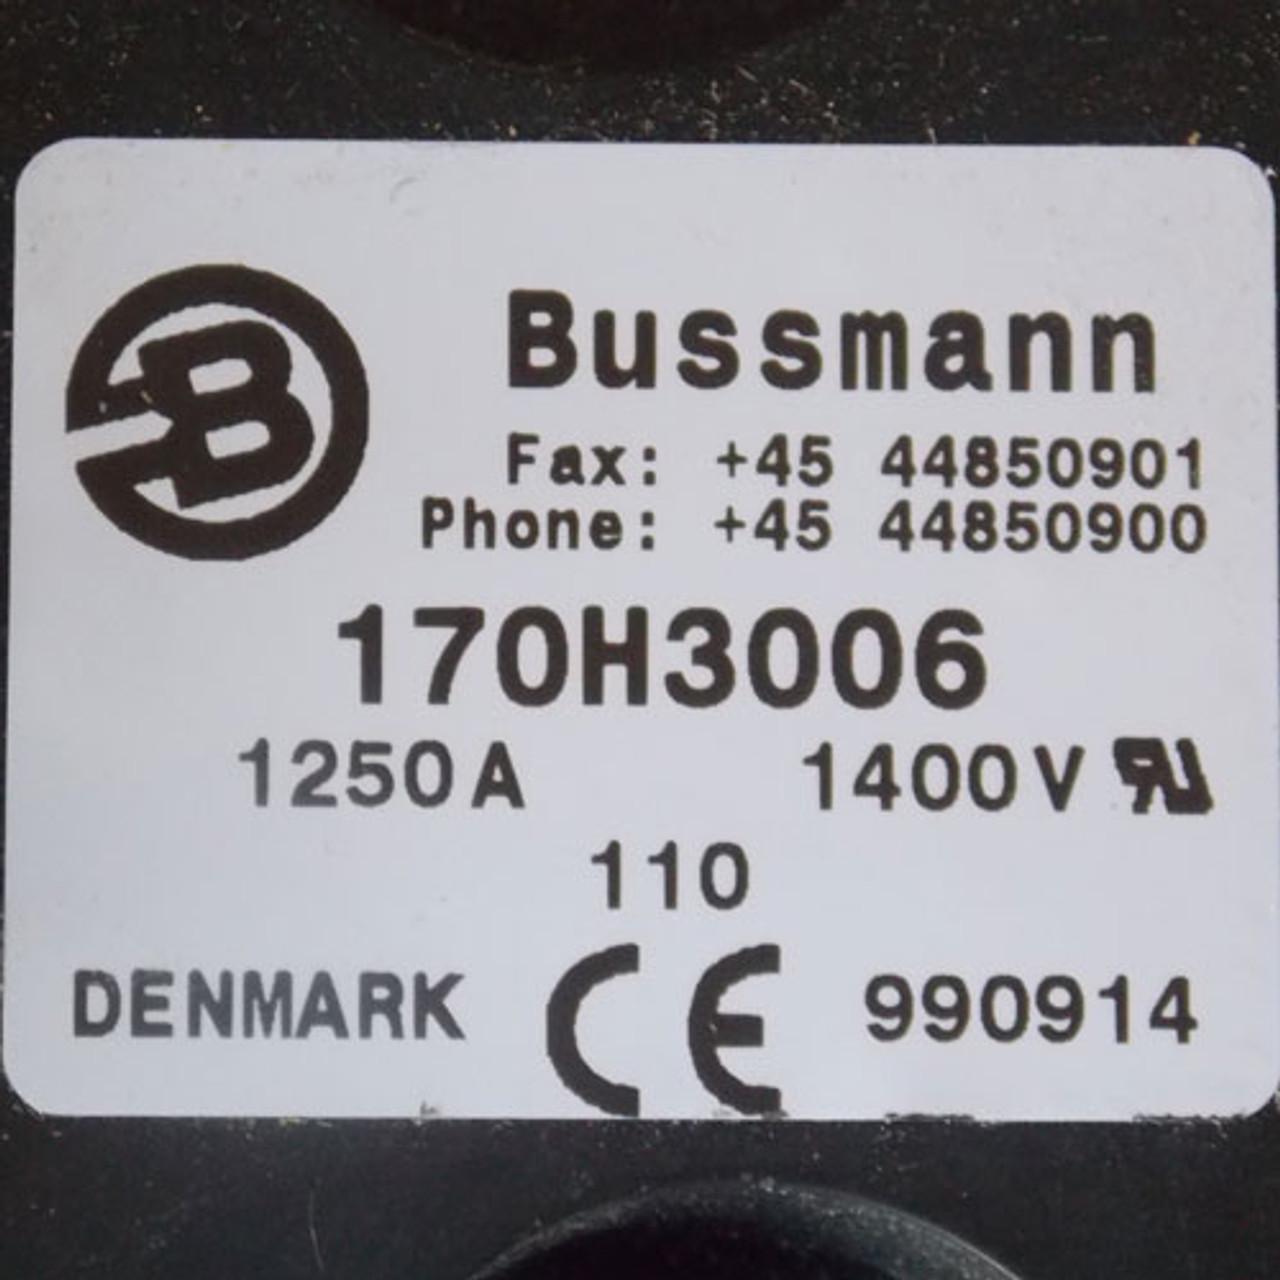 Denmark Bussmann 170H3006 1250 Amp 1400 Volt Fuse Base - New